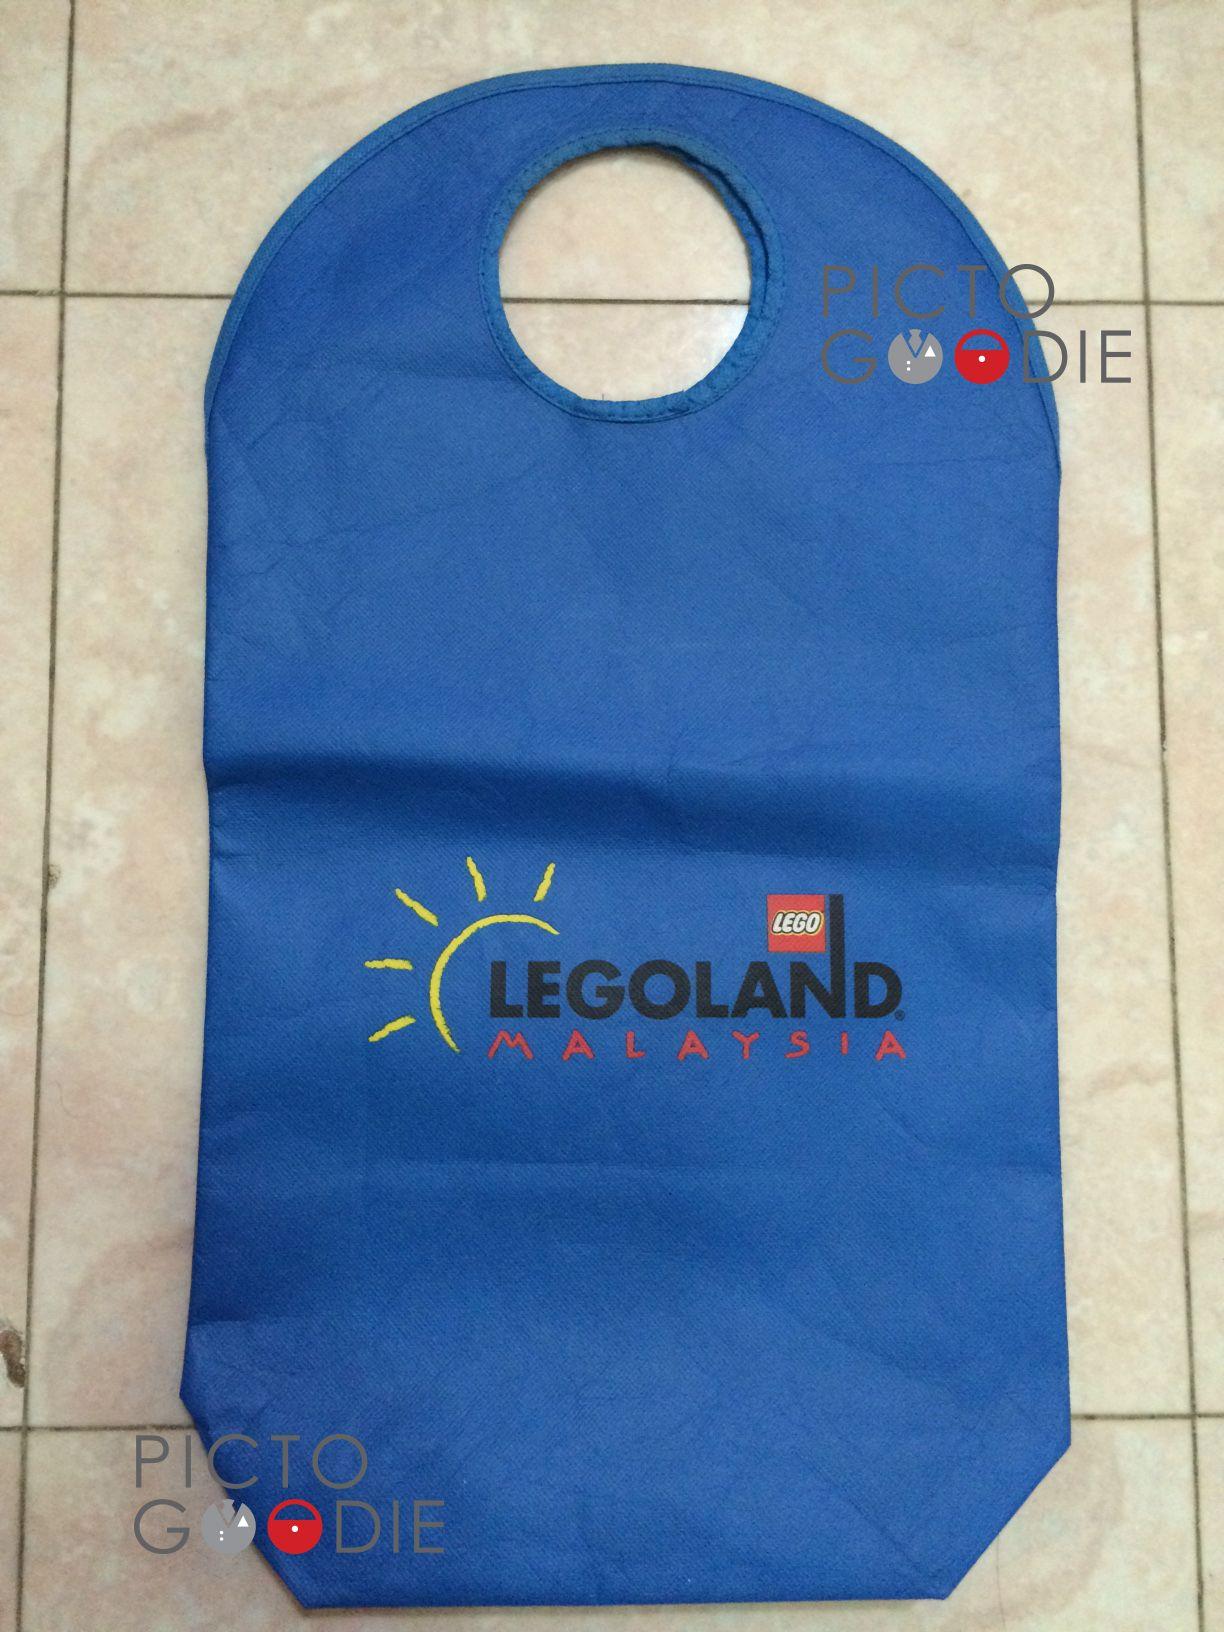 Tas Promosi - Legoland Malaysia (Dengan gambar)   Tas